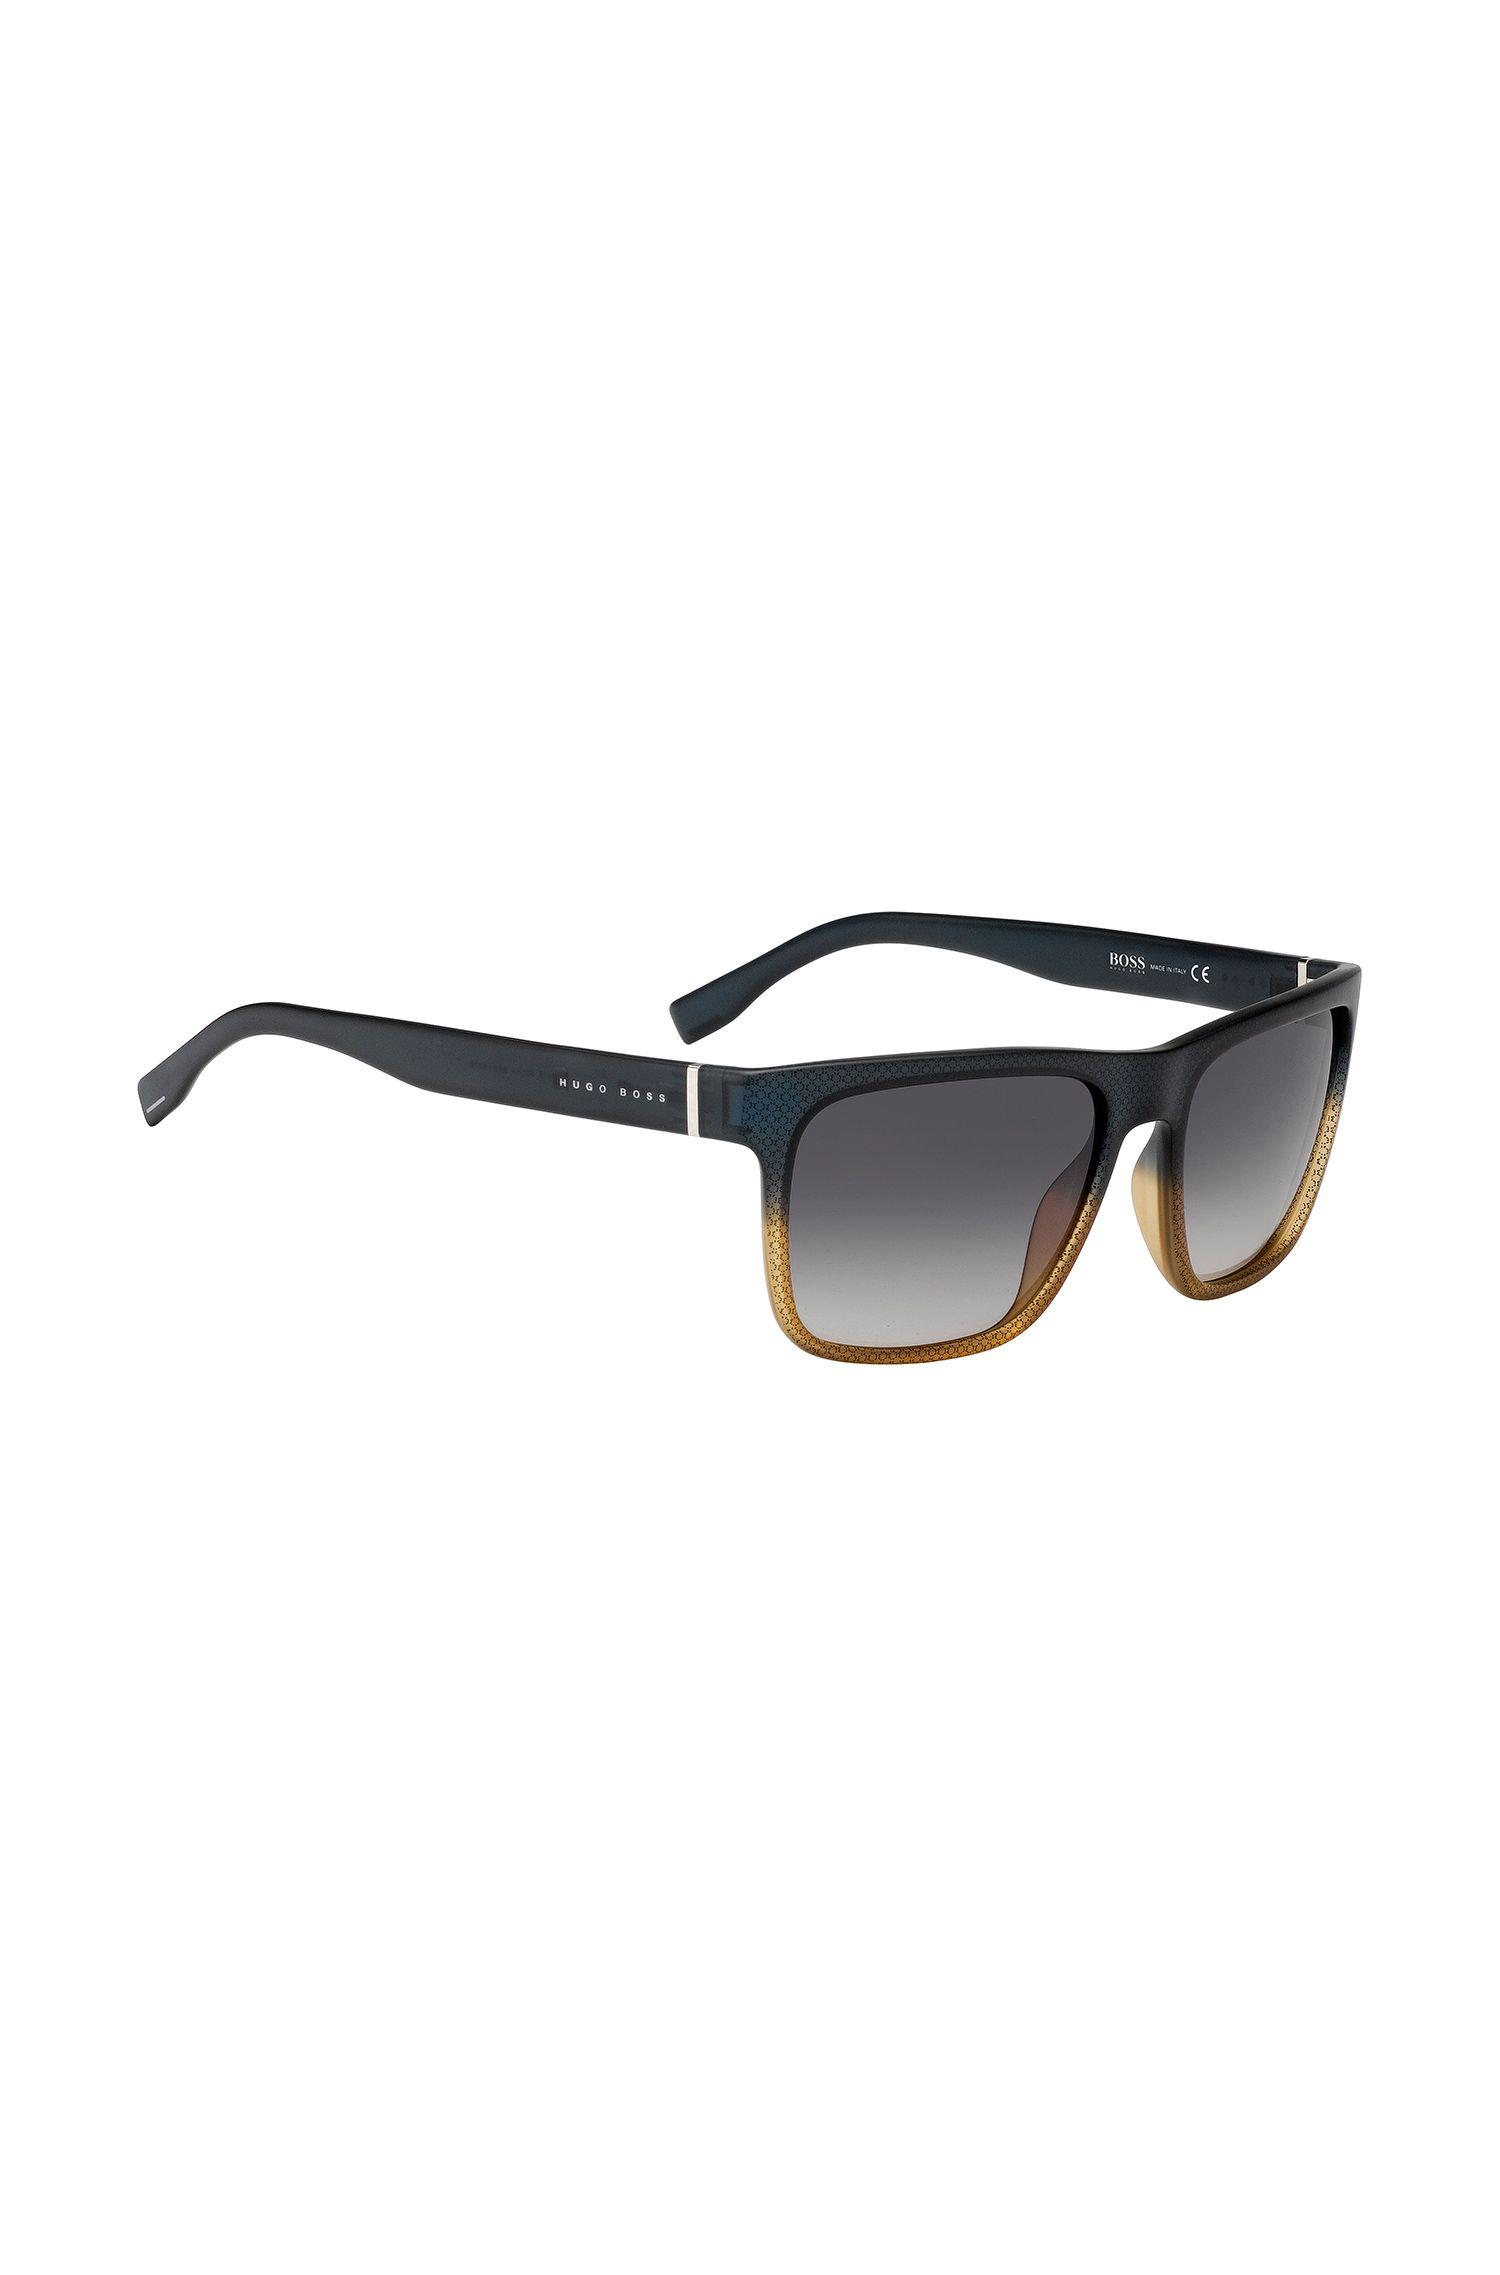 Sunglasses: 'BOSS 0727/S'